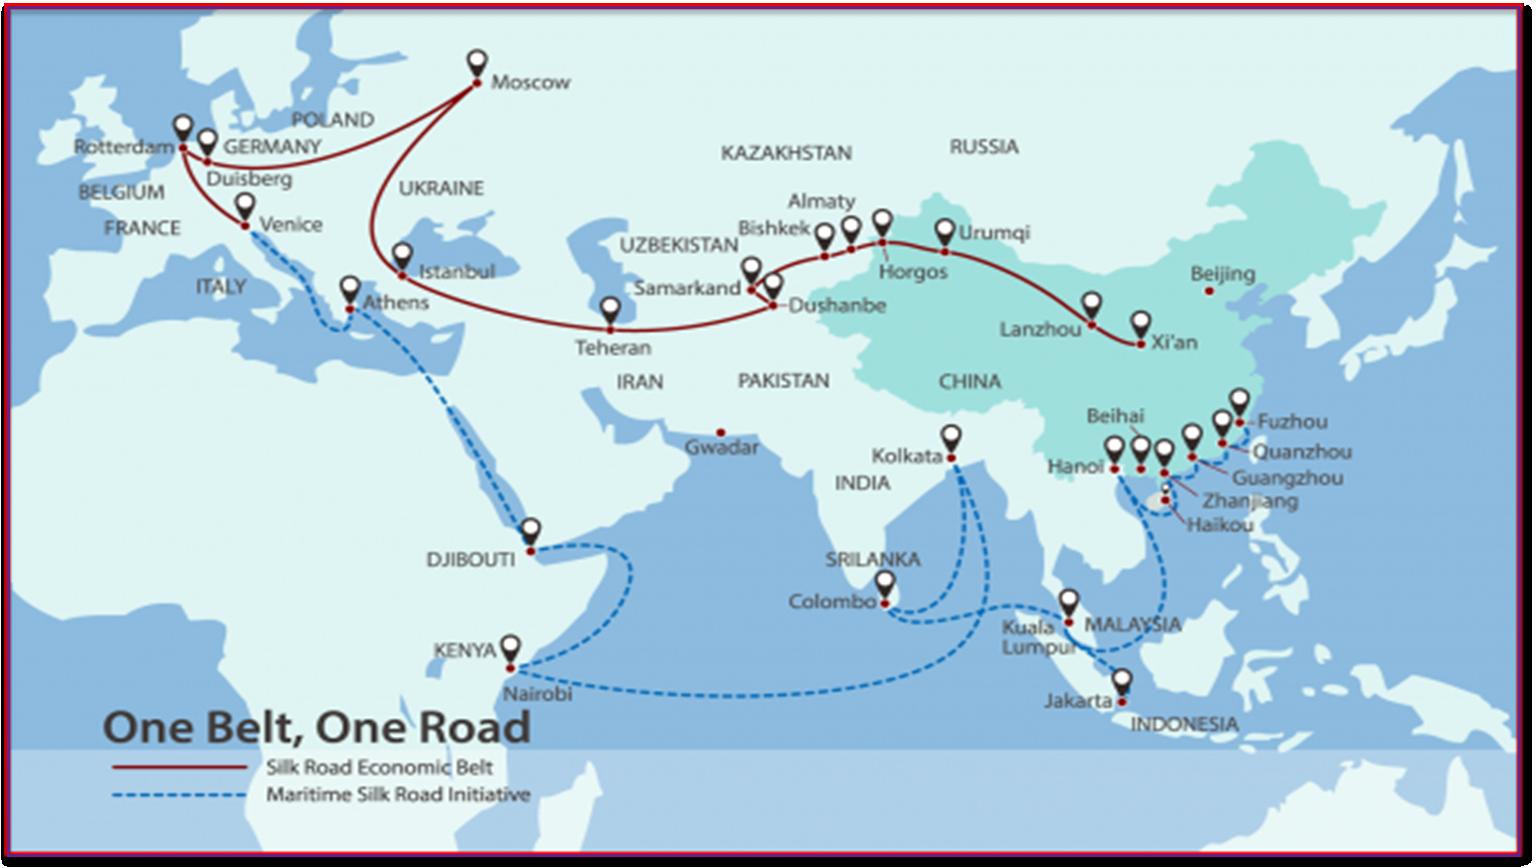 img-pst-03.01.01-rise-of-china-03-silk-road-01-1536-x-868